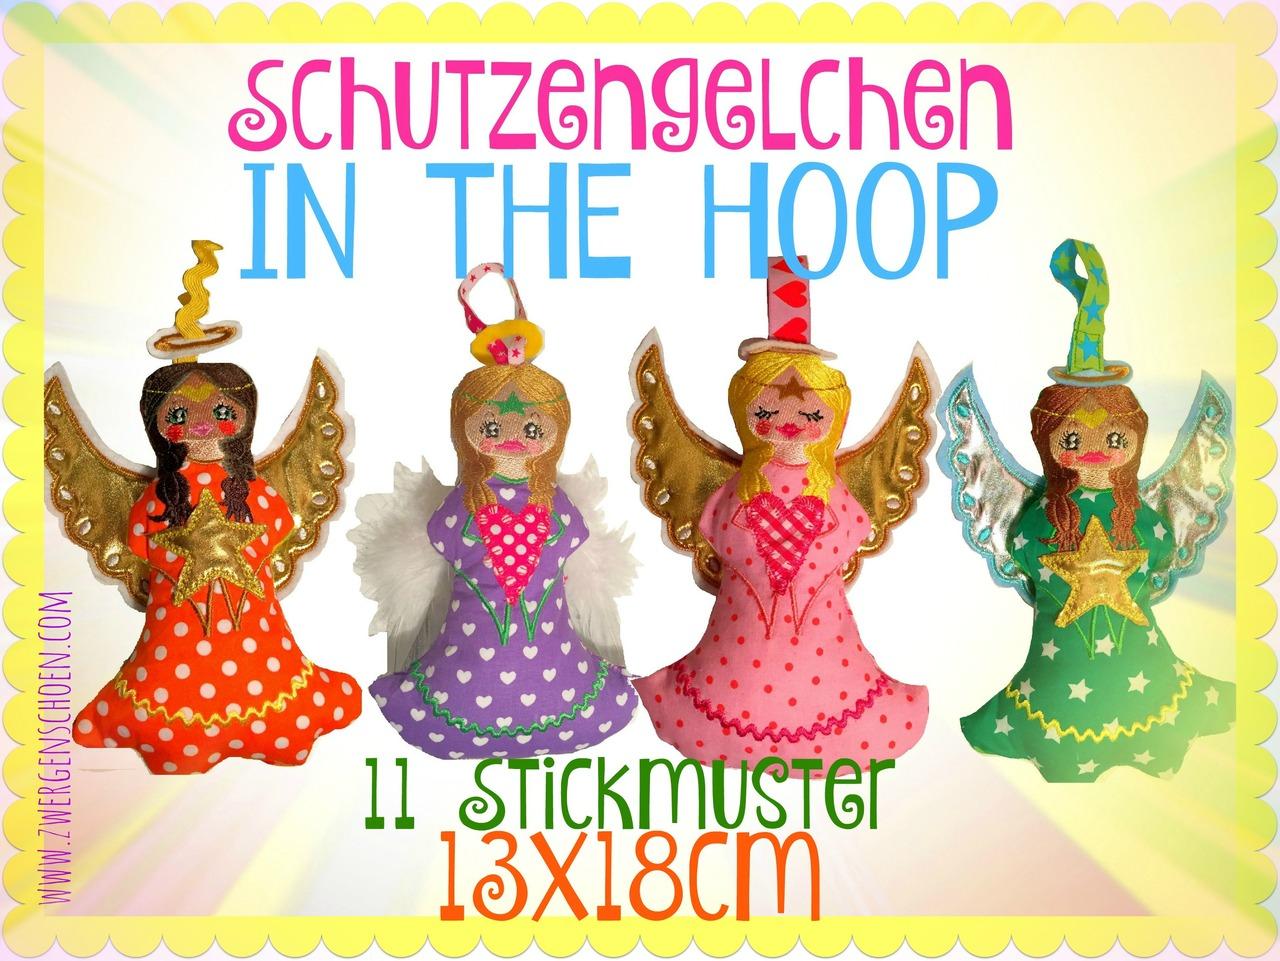 ♥SCHUTZengelchen♥ITH Stickmuster 13x18cm Engel IN THE HOOP